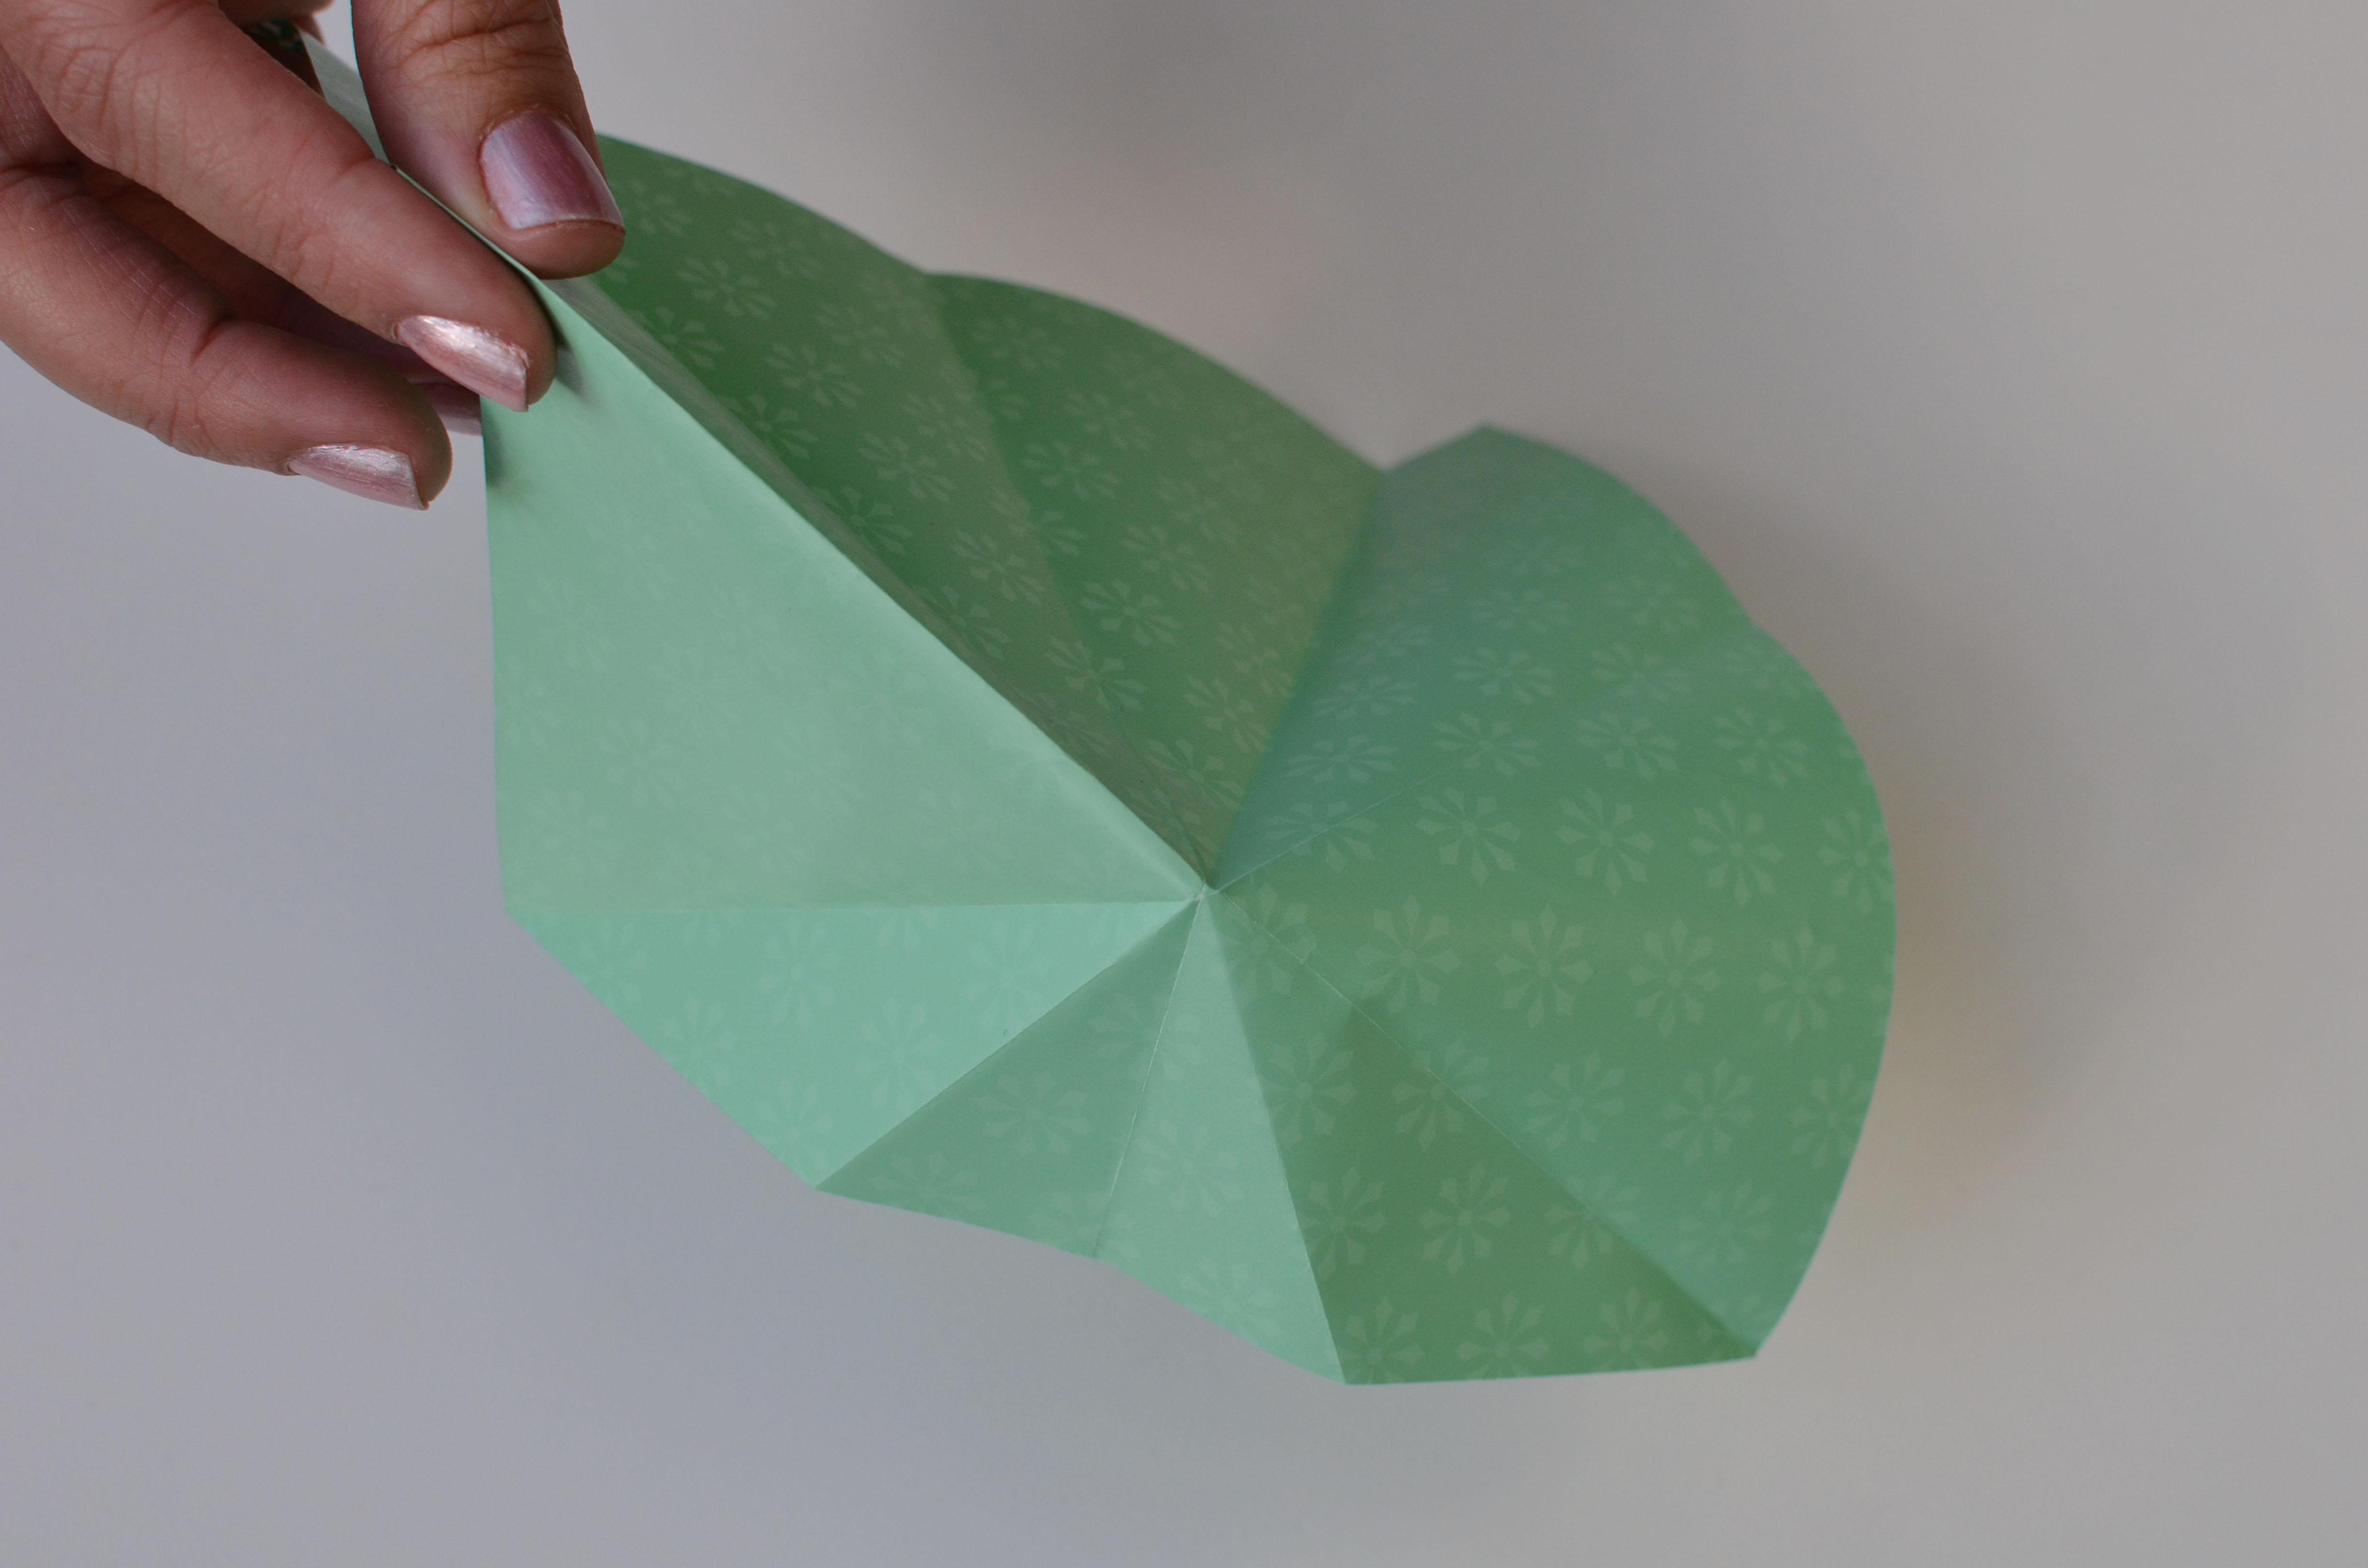 braincrafts_frog_origami_pt14.jpg